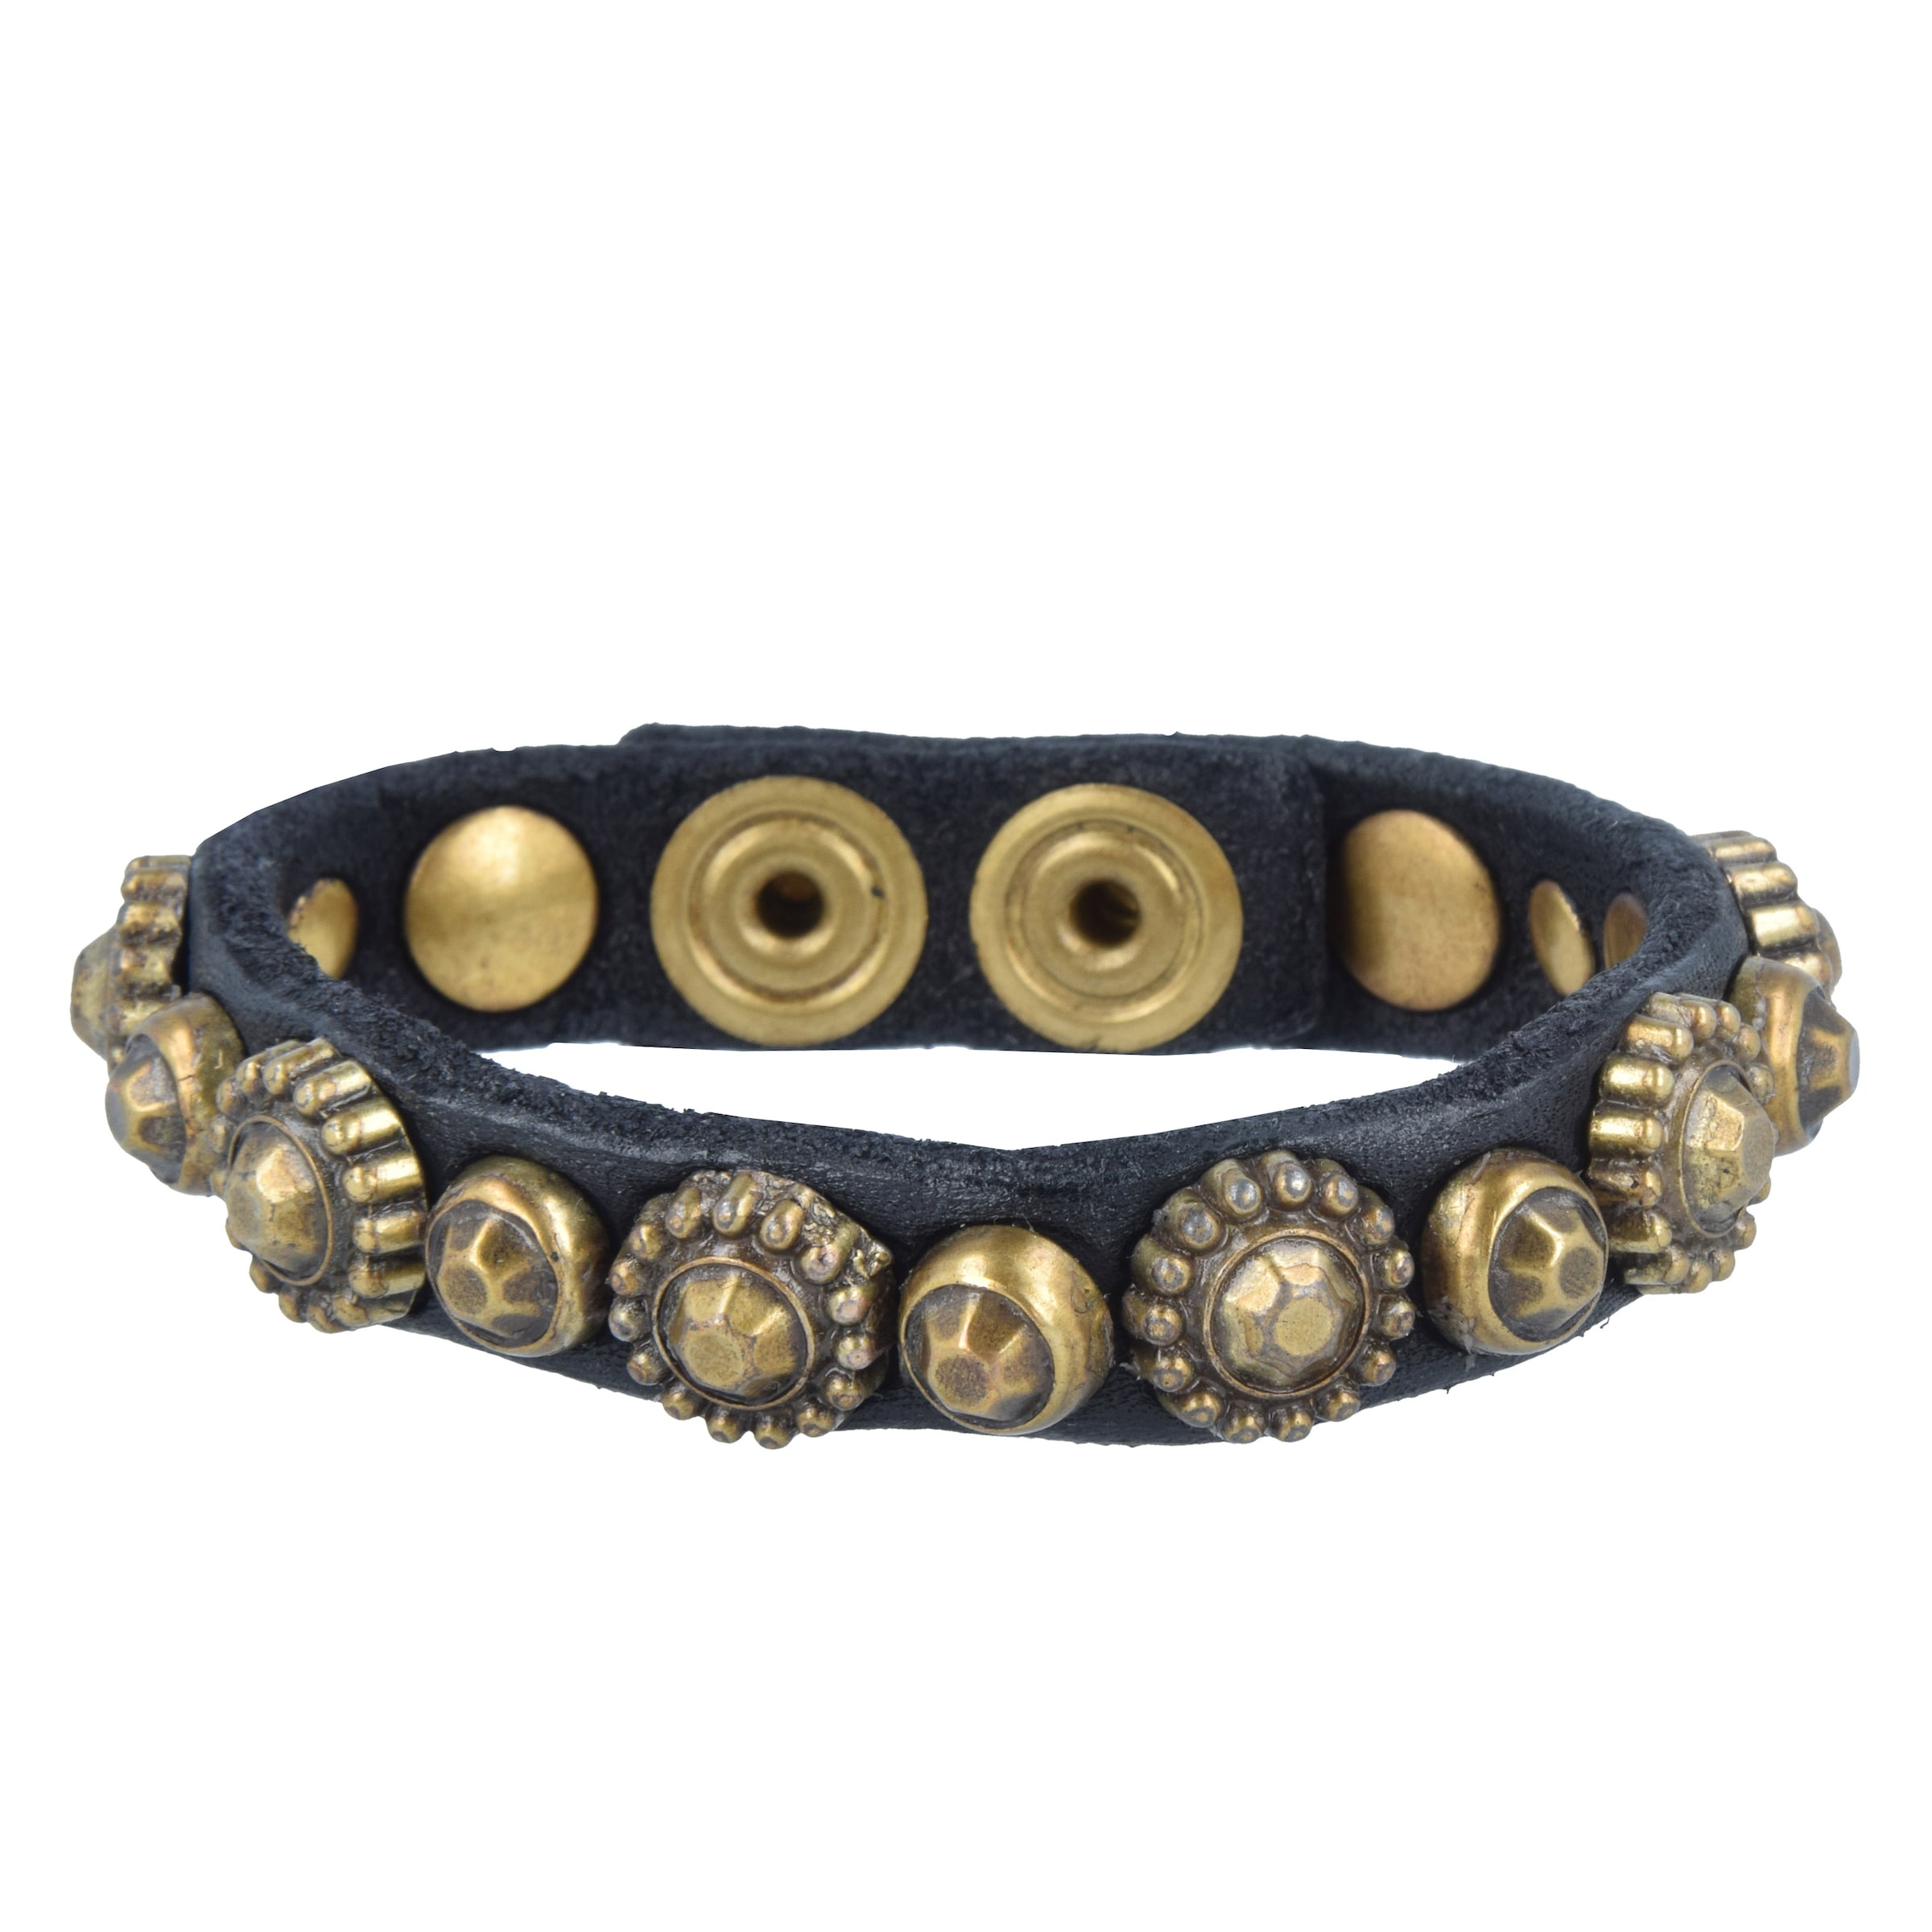 Bracelet Bracelet Bracelet En En Campomaggi Campomaggi Campomaggi Bracelet Campomaggi OrNoir OrNoir En OrNoir OXTkZiuP